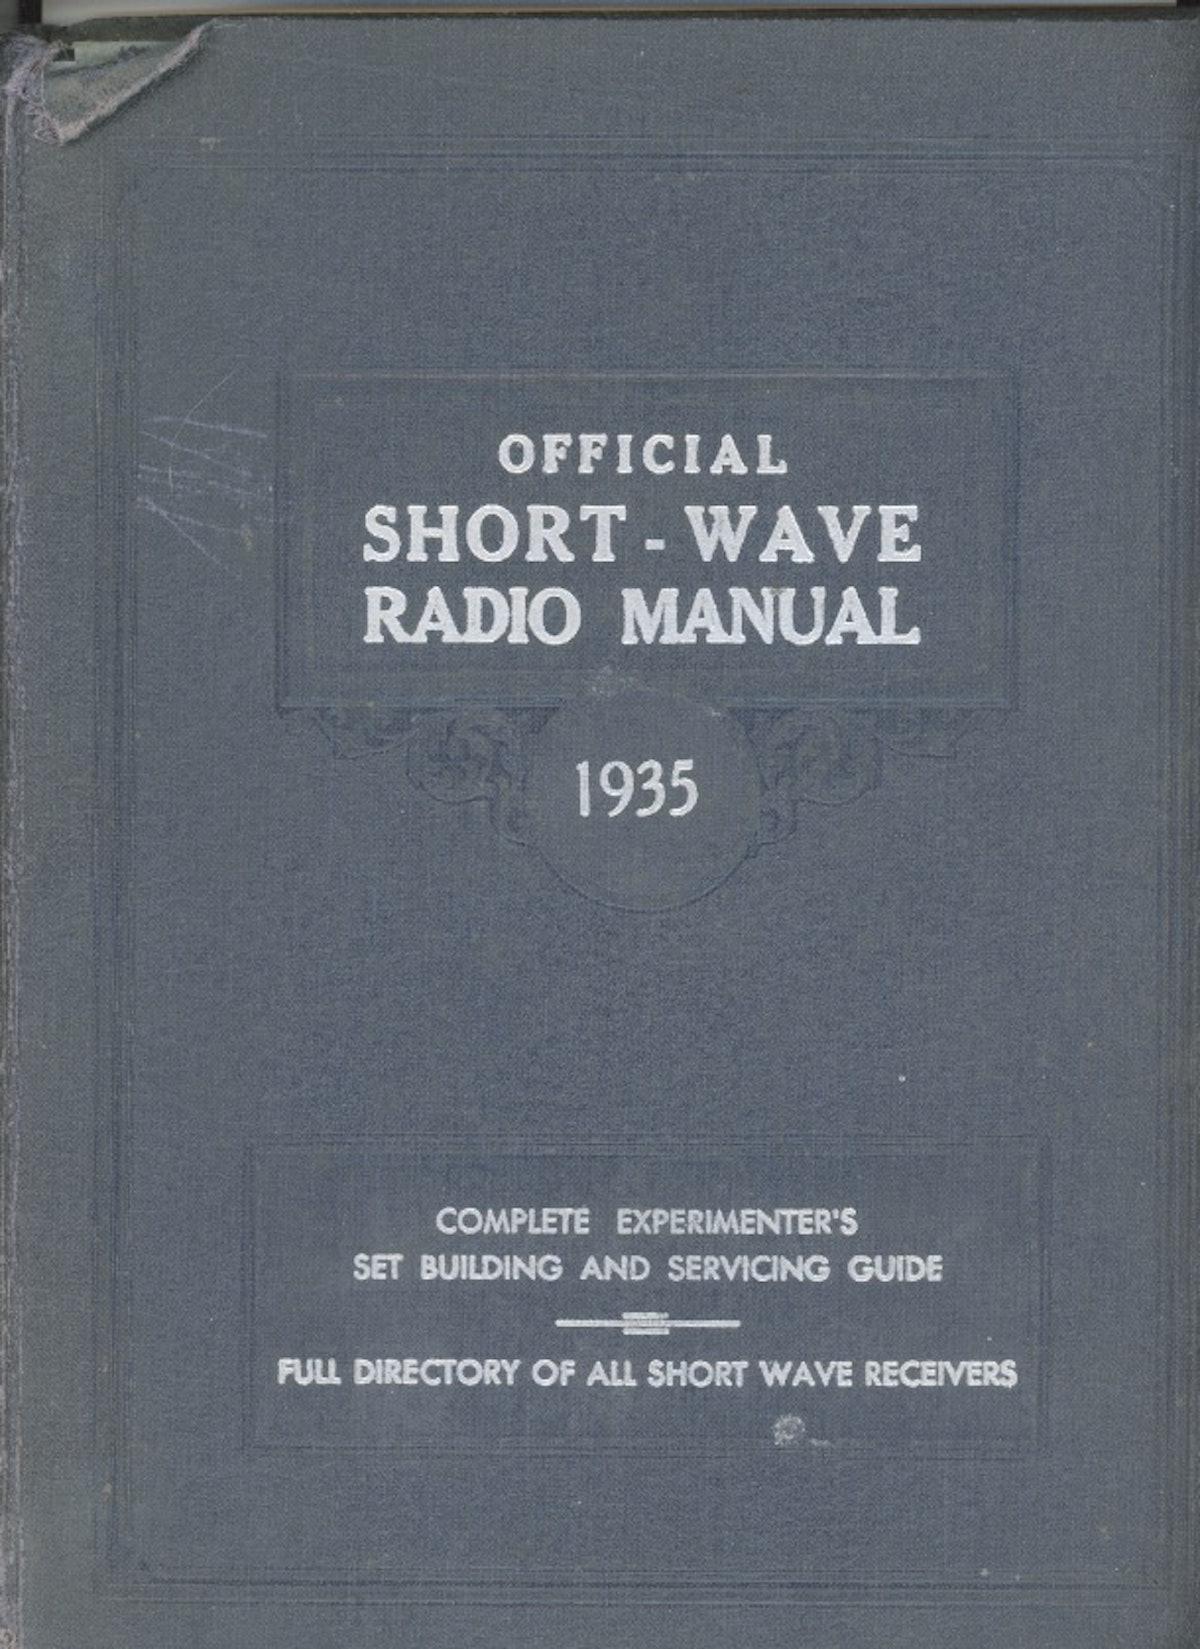 Official Short-Wave Radio Manual 1935